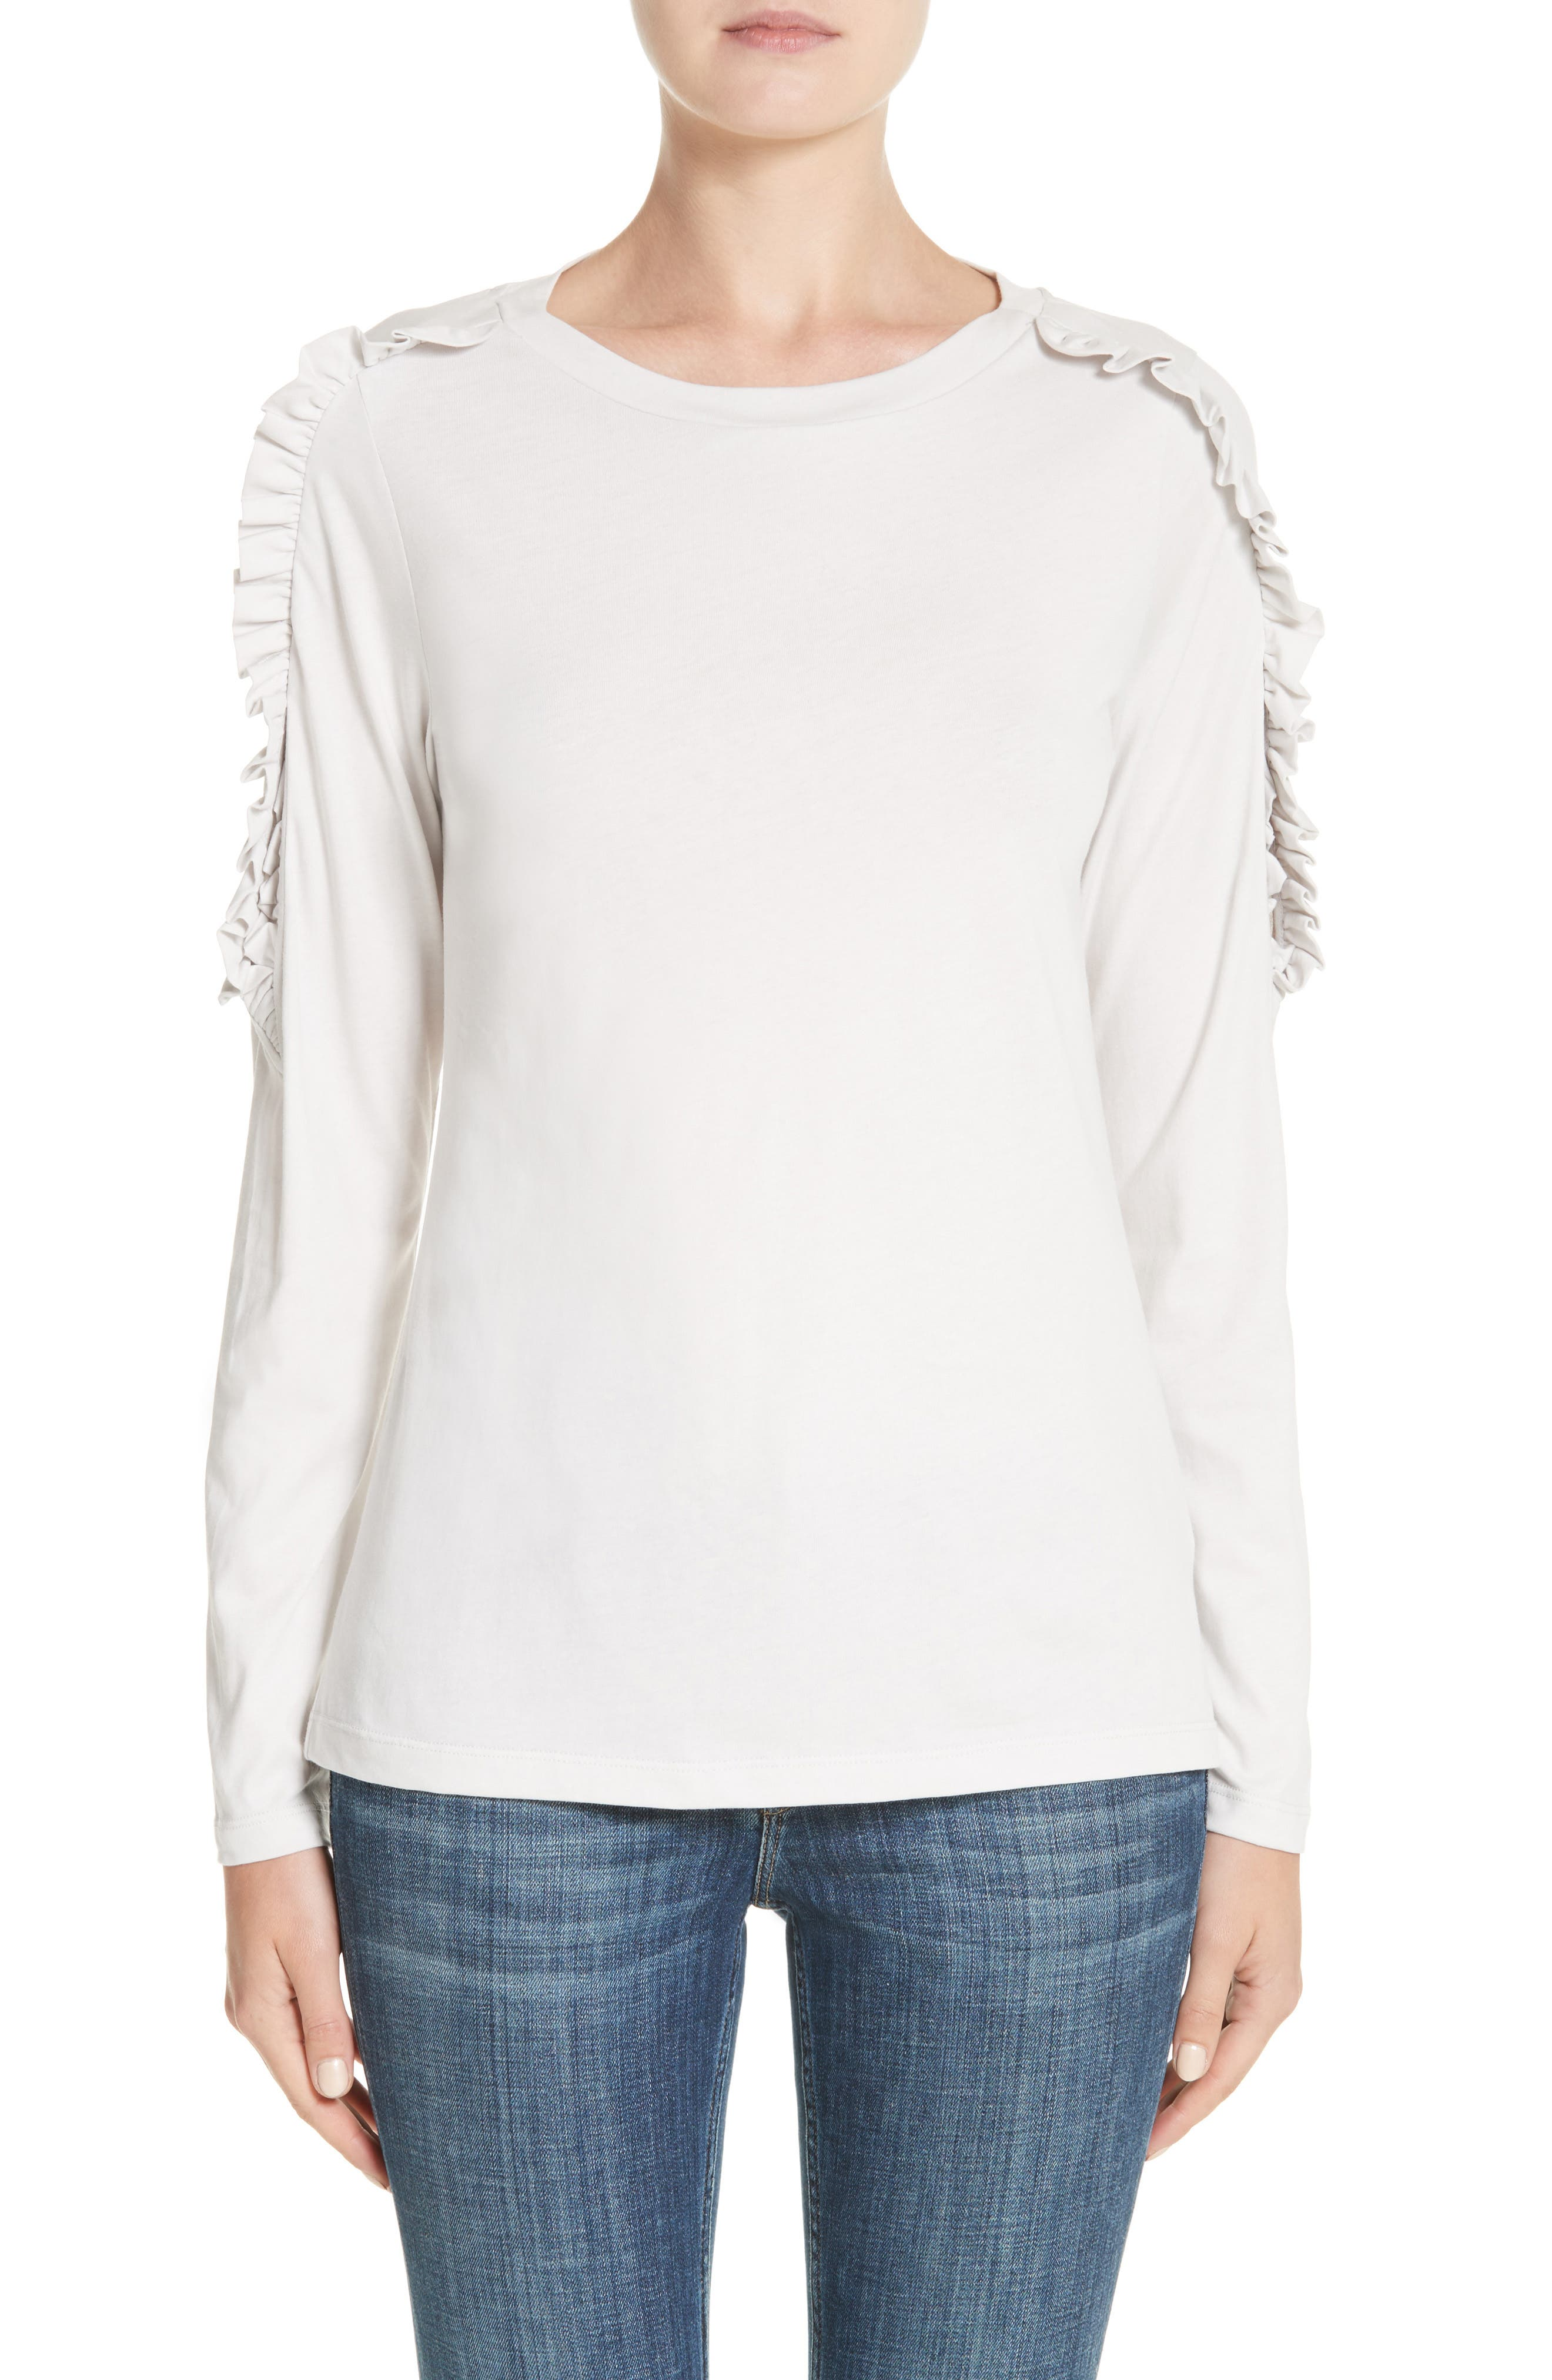 Alternate Image 1 Selected - Burberry Uima Ruffle Cotton Top